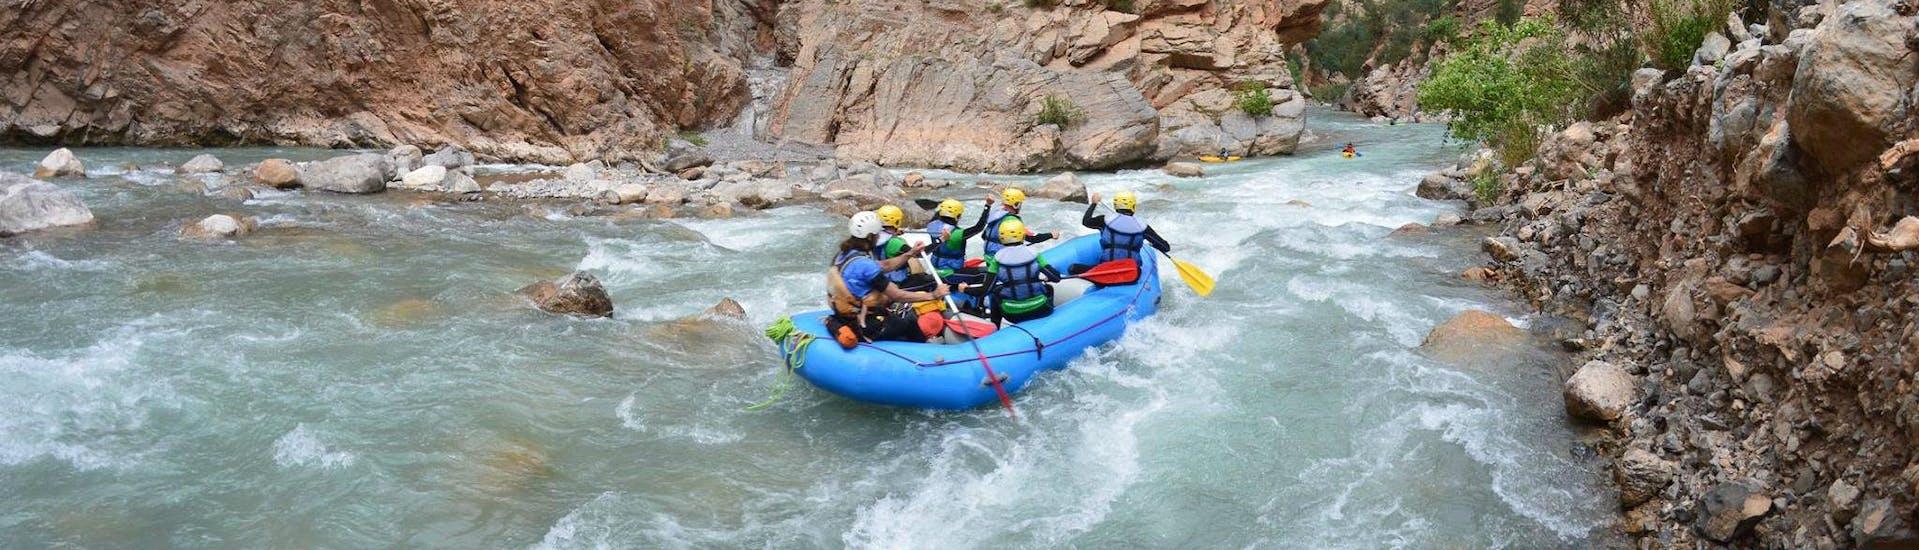 rafting-naturelover---rio-guardiana-menor-gualay-aventura.hero